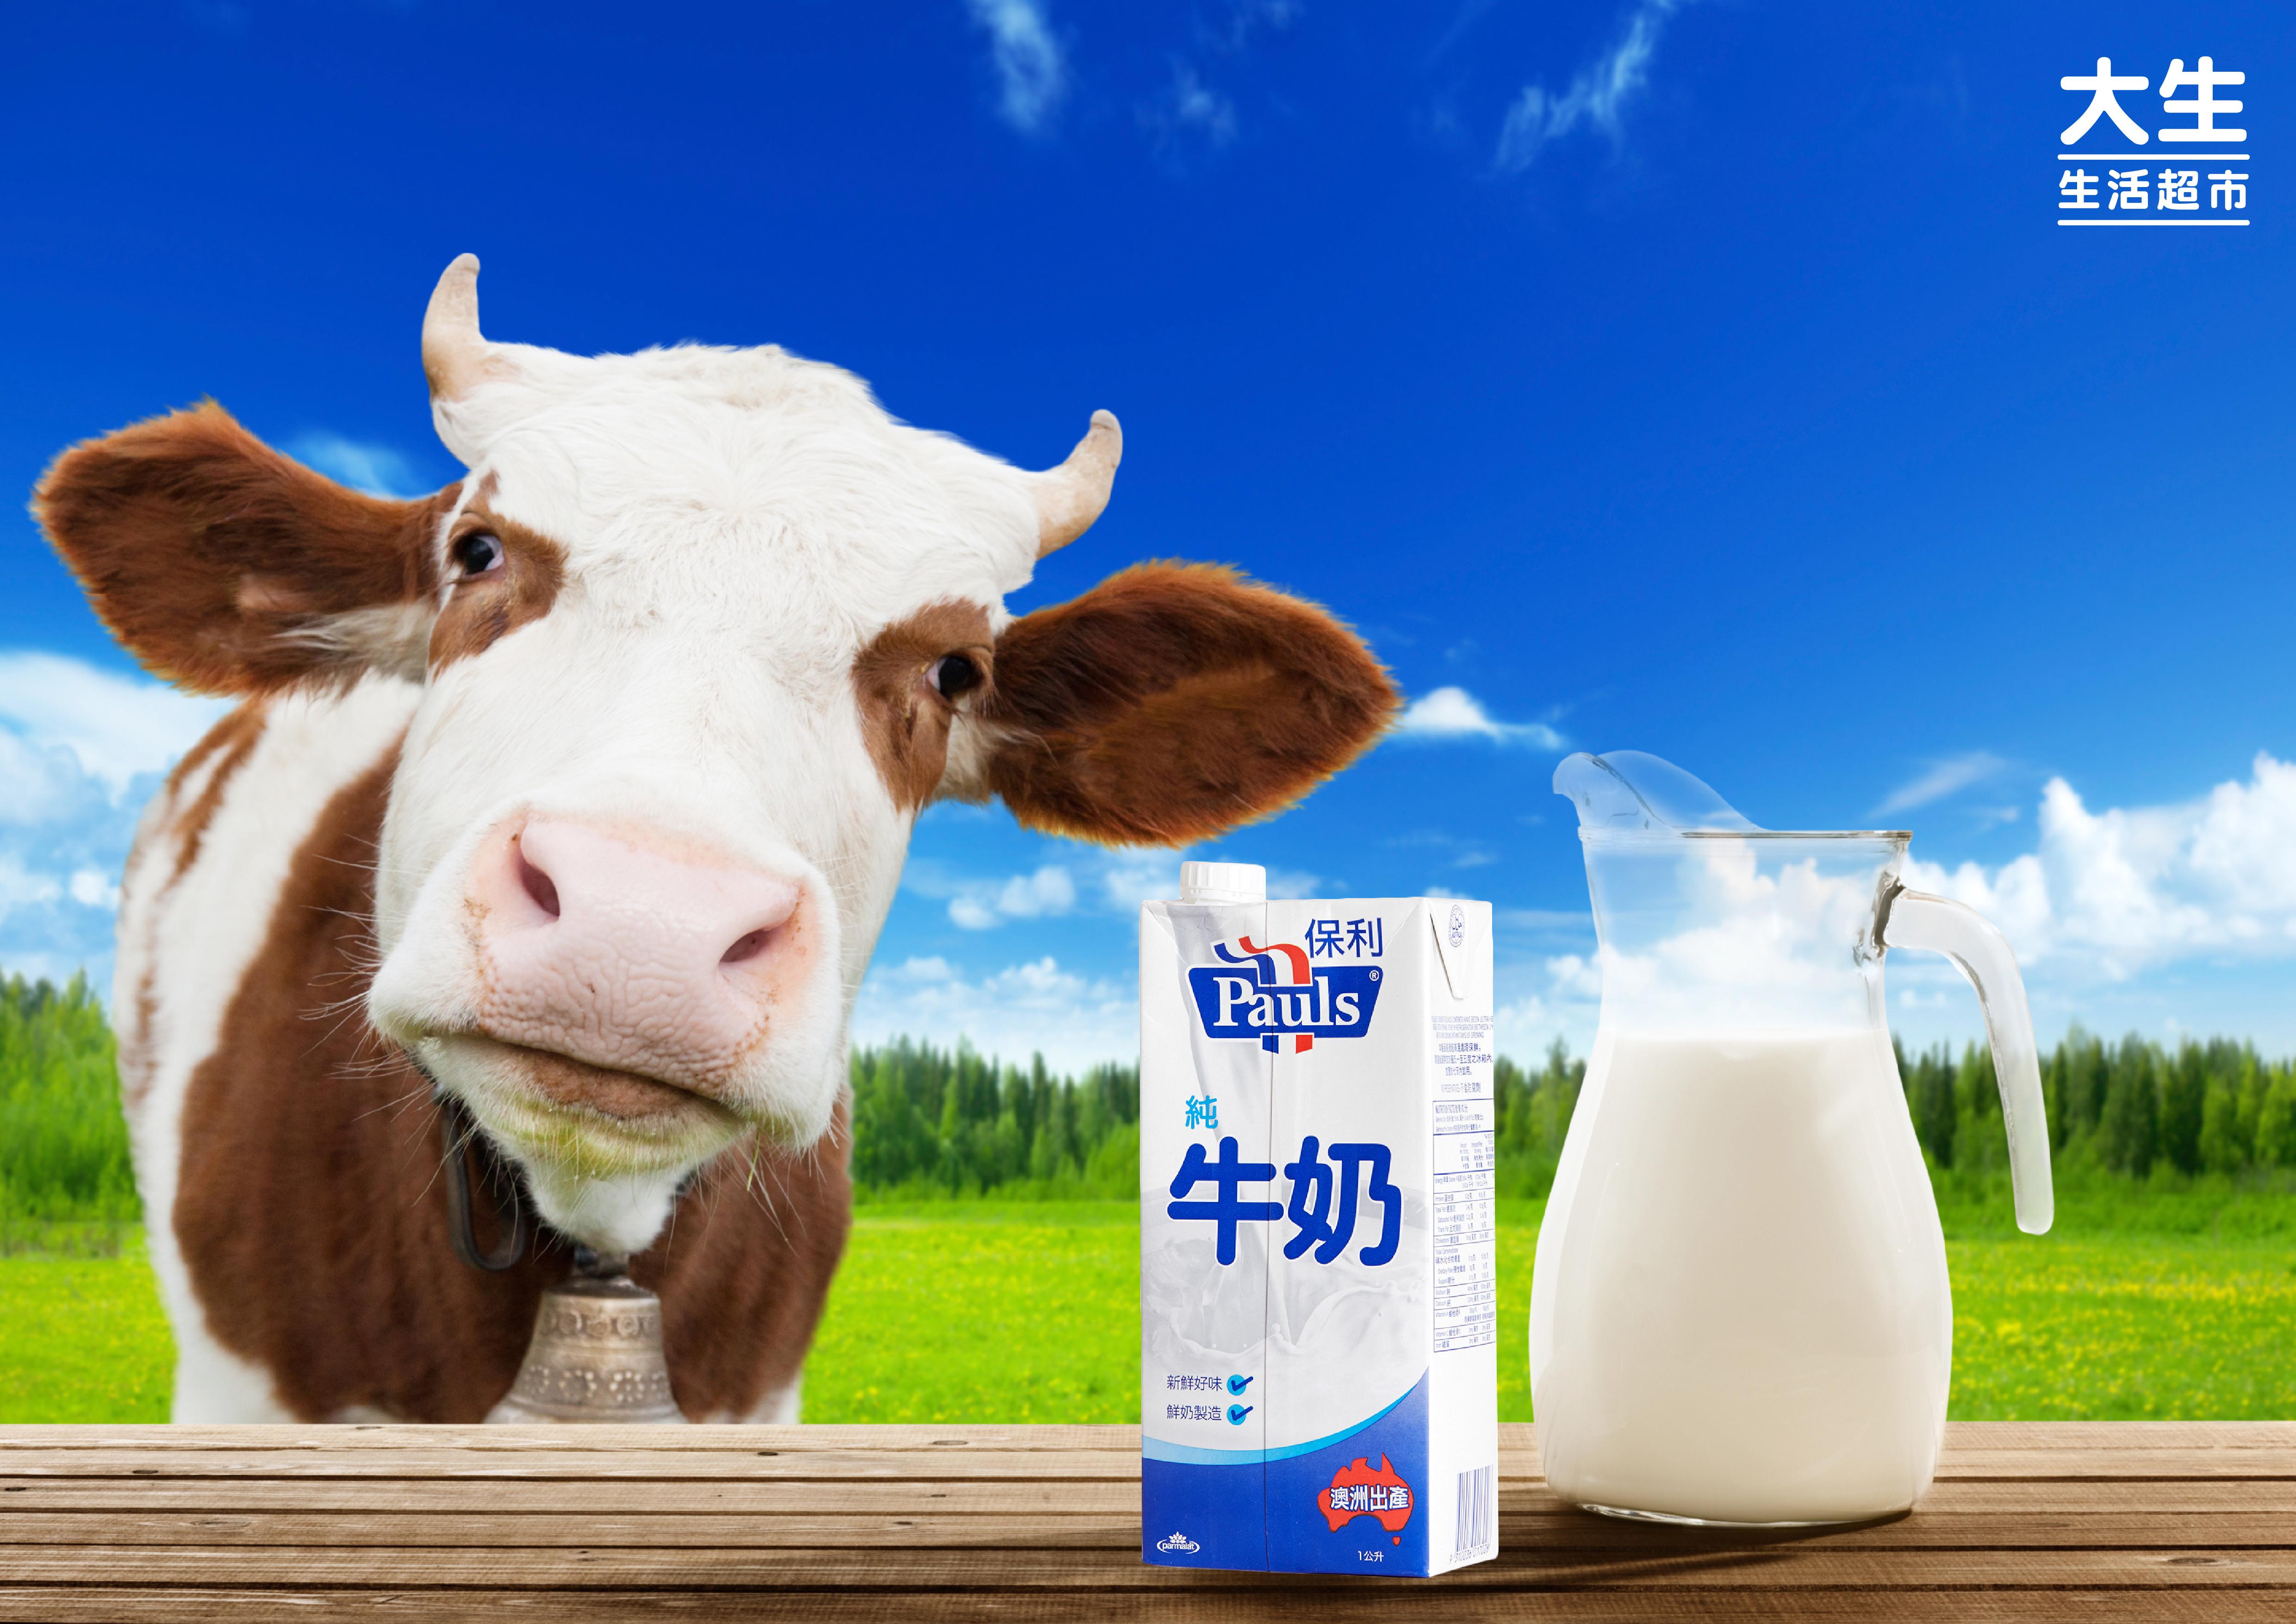 澳洲保利純牛奶Pauls